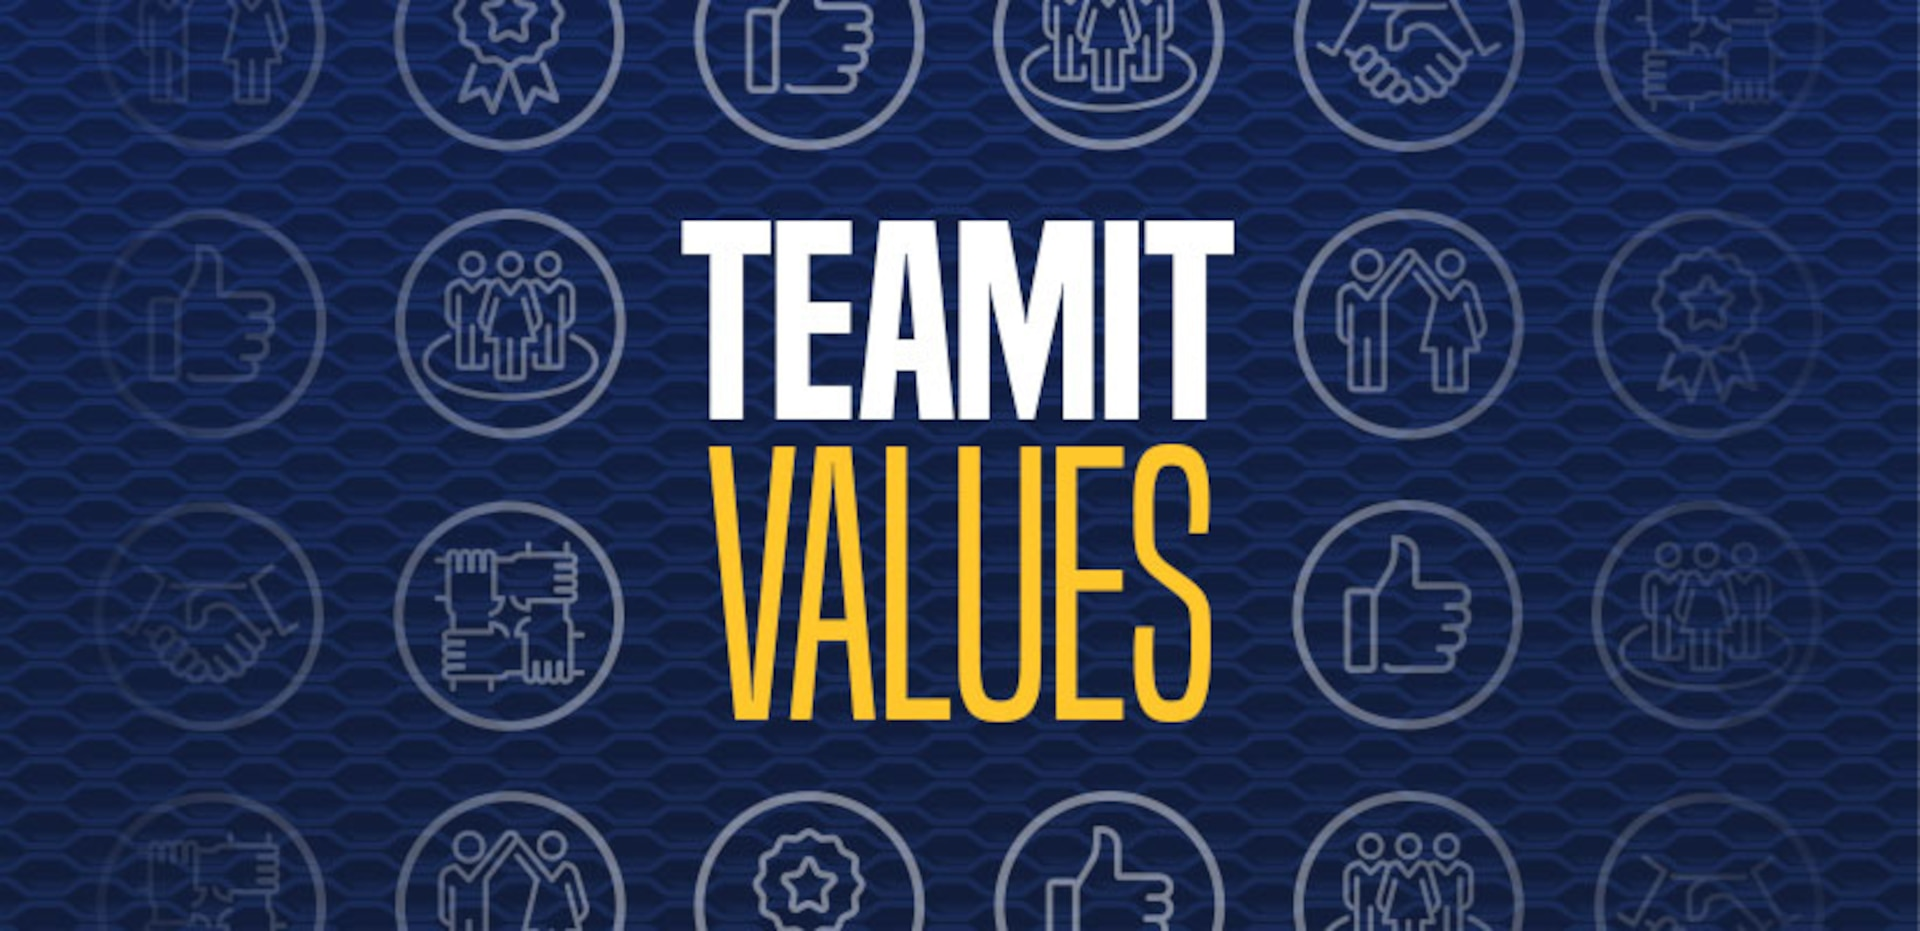 DCAA TEAMIT Values